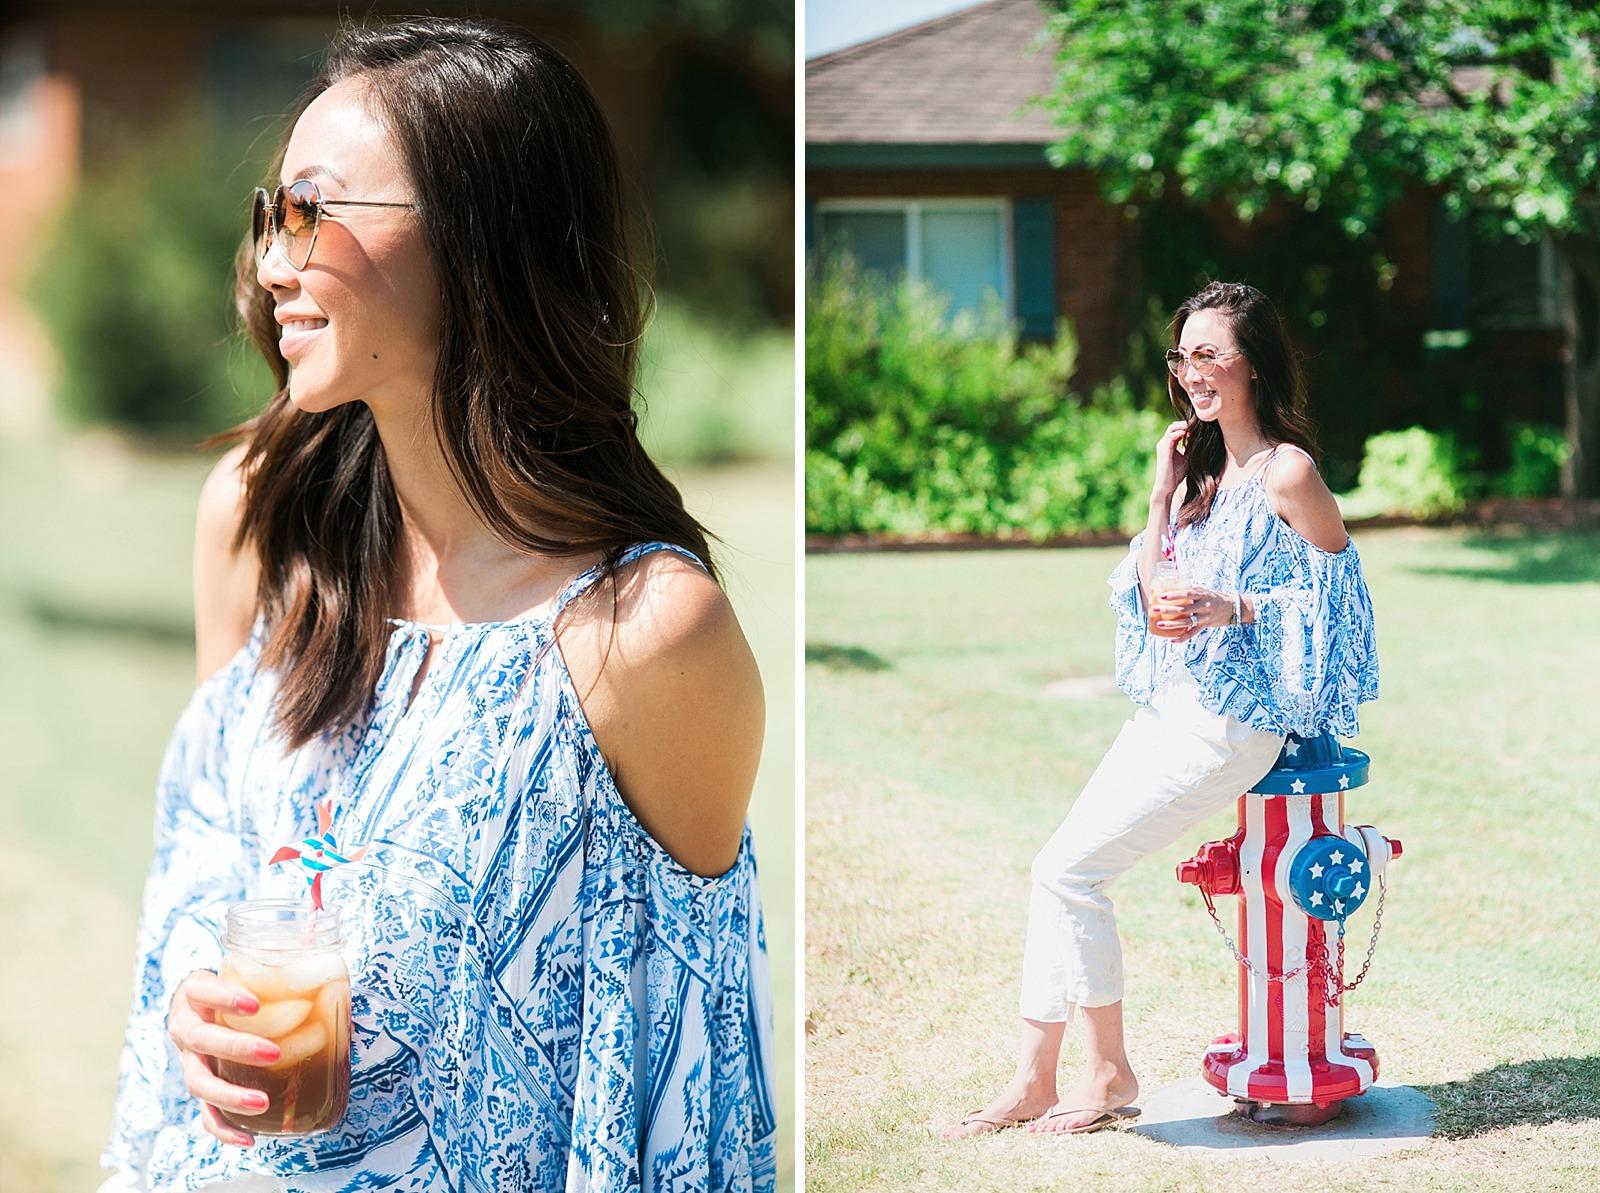 american-flag-fire-hydrant-painted-artistic-lifestyle-blogger-diana-elizabeth-blog-arizona-fashion-pool-summer-time_0099